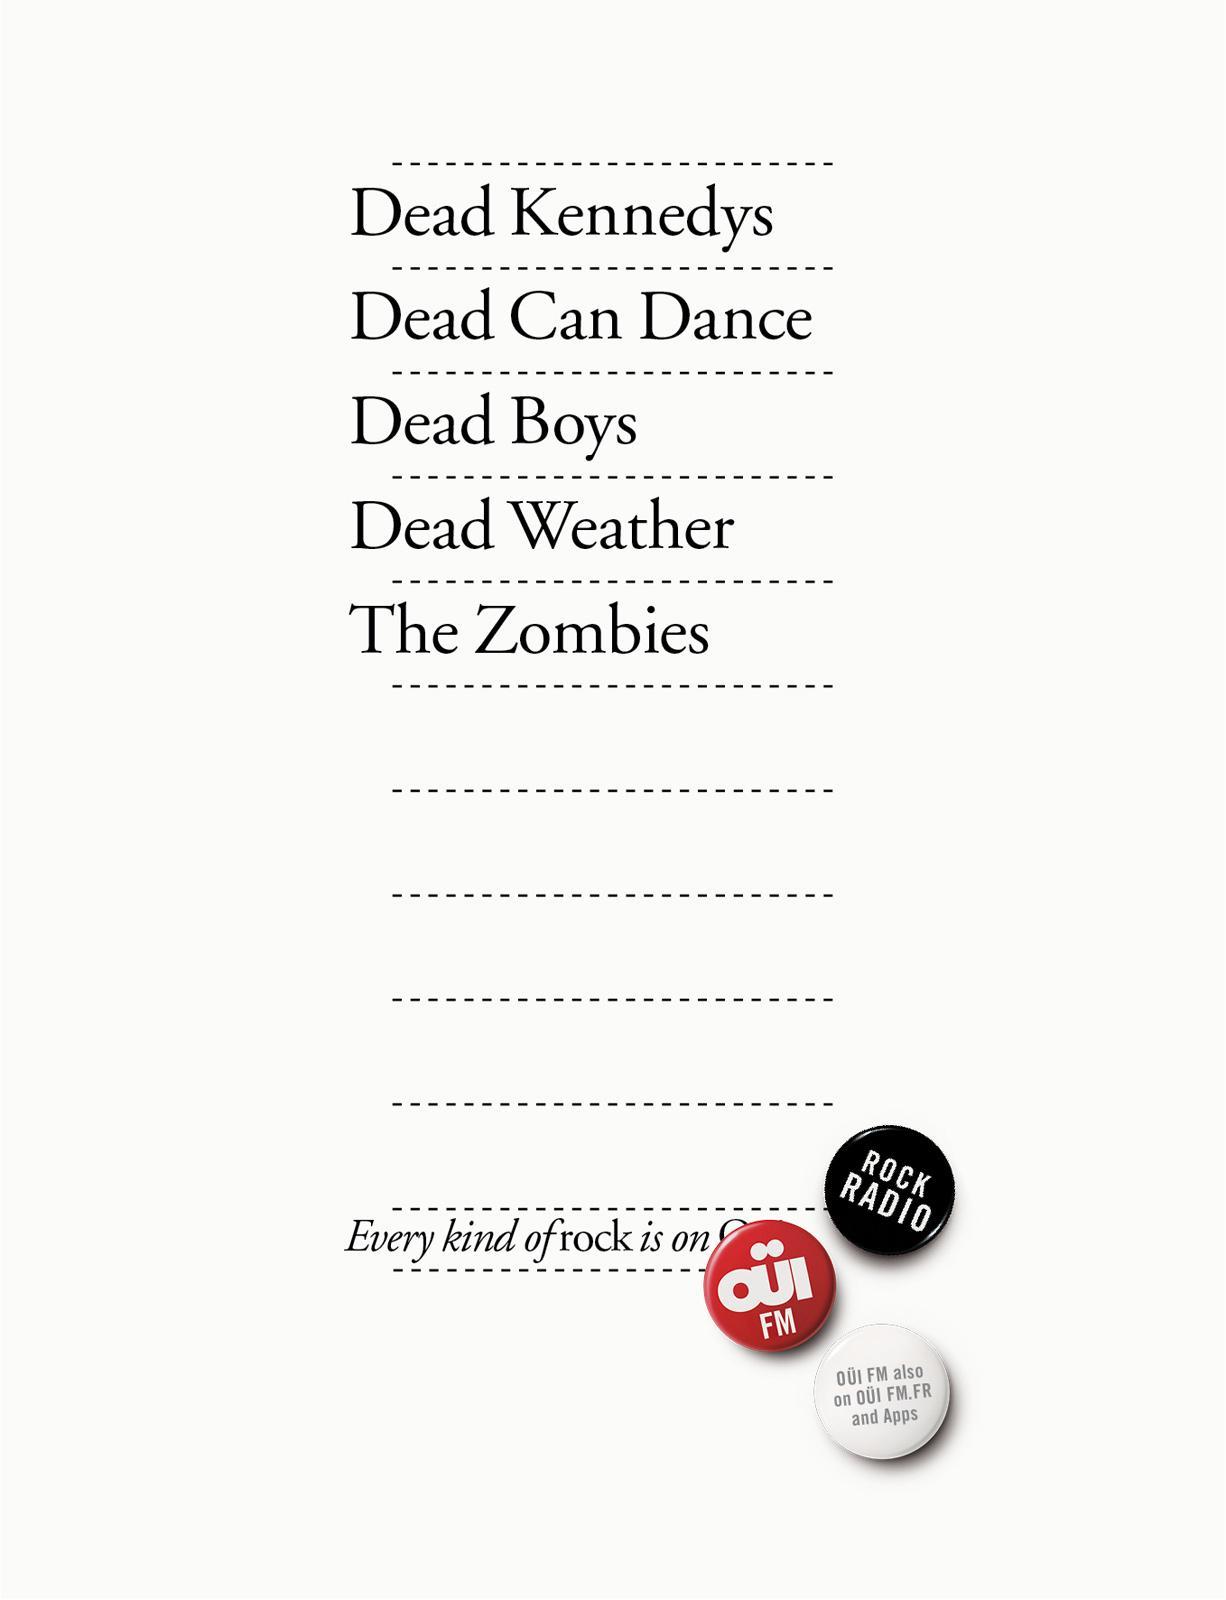 Oui FM Print Ad -  Every kind of rock, 3